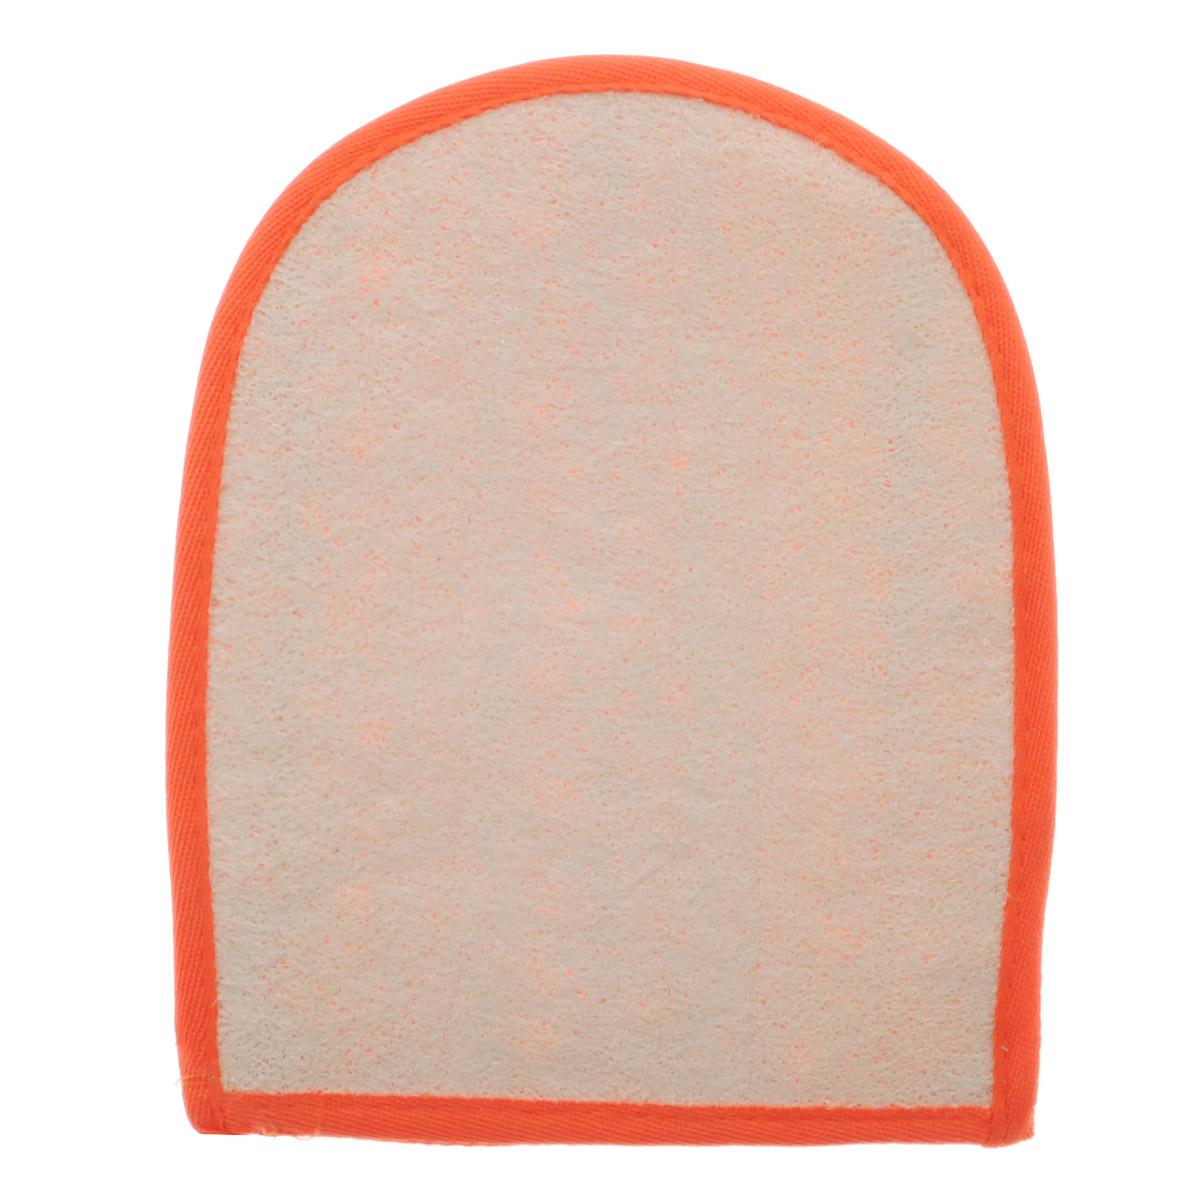 Мочалка-рукавица Home Queen, из люфы, цвет: оранжевый, 20 х 16 см